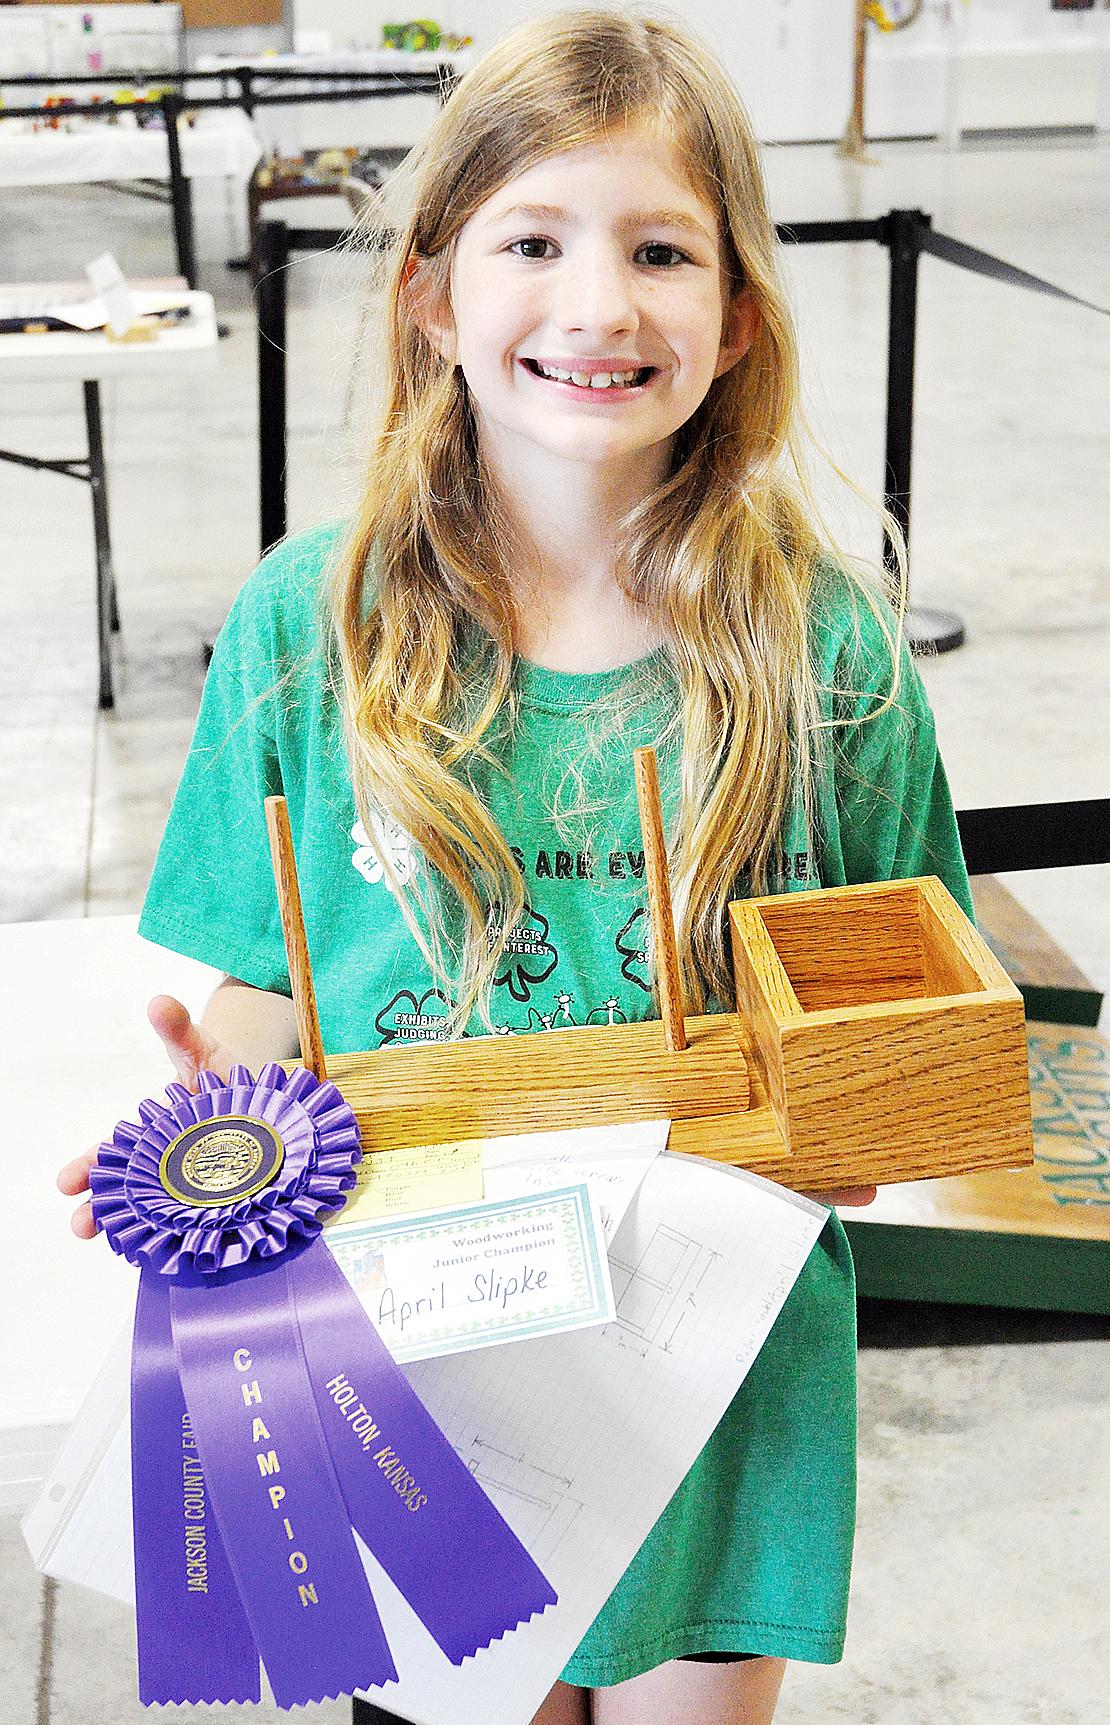 April Slipke - Junior Woodworking